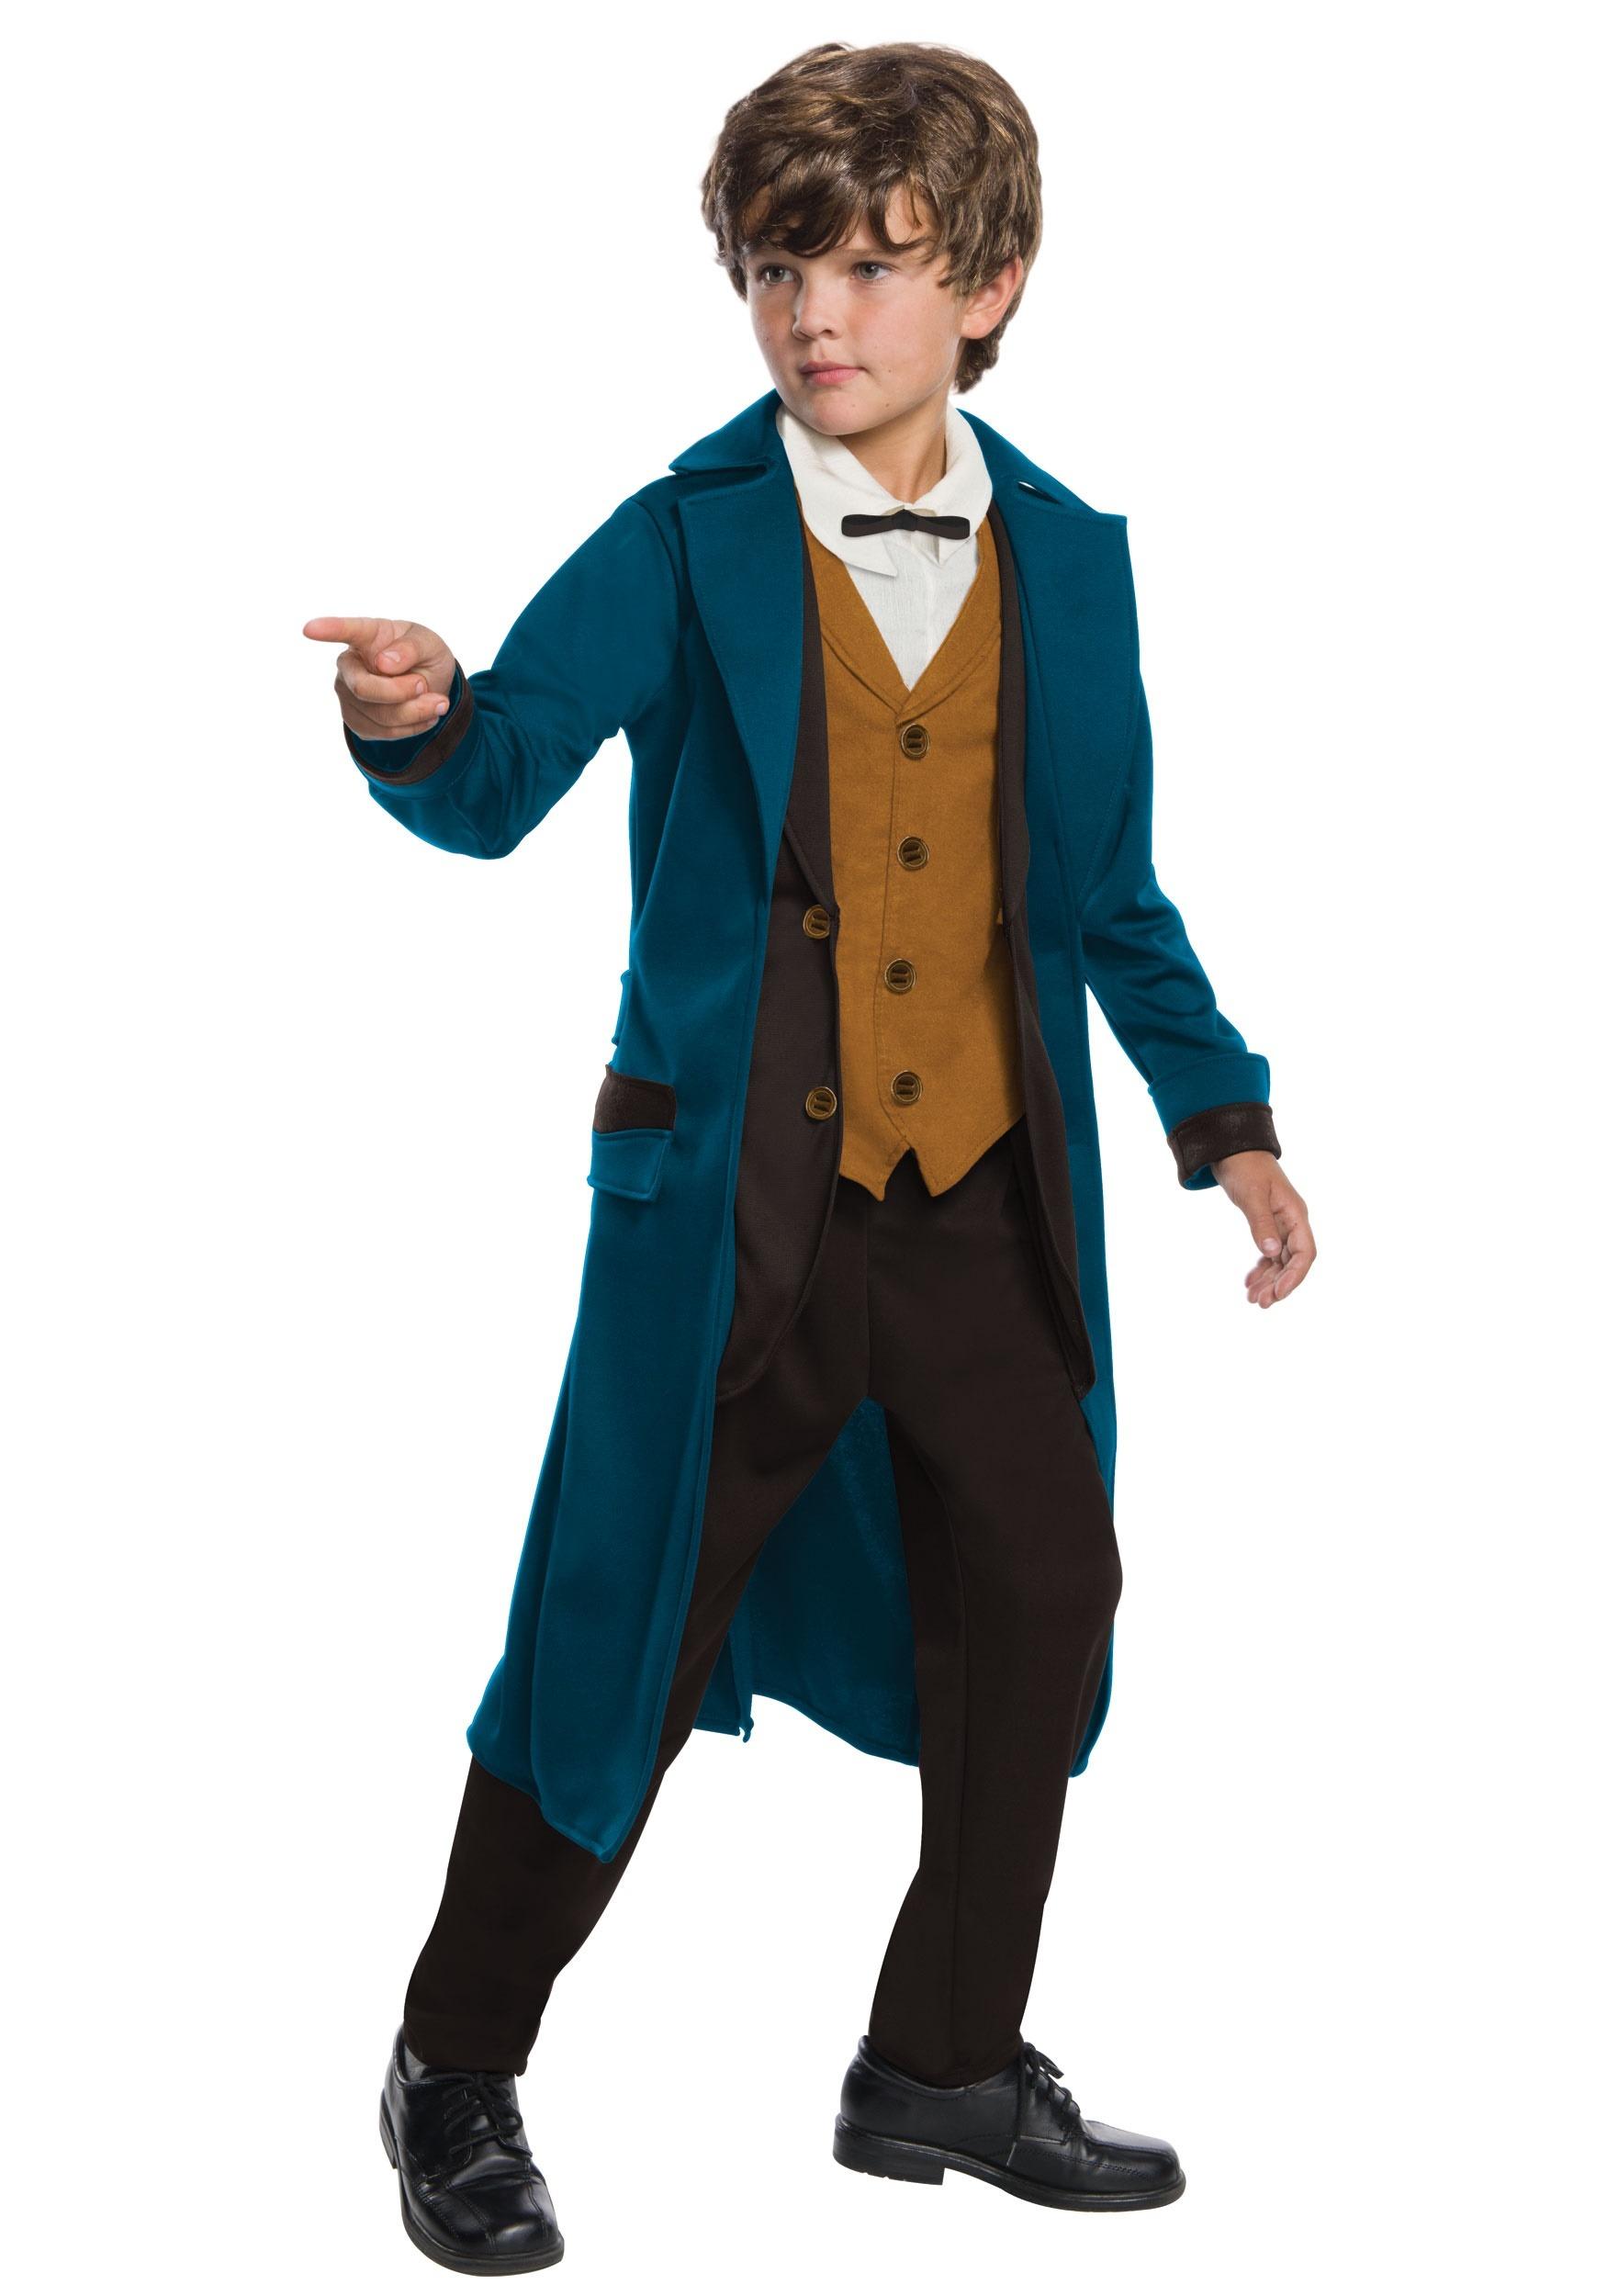 Fantastic Beasts Newt Scamander Deluxe Costume For Boys